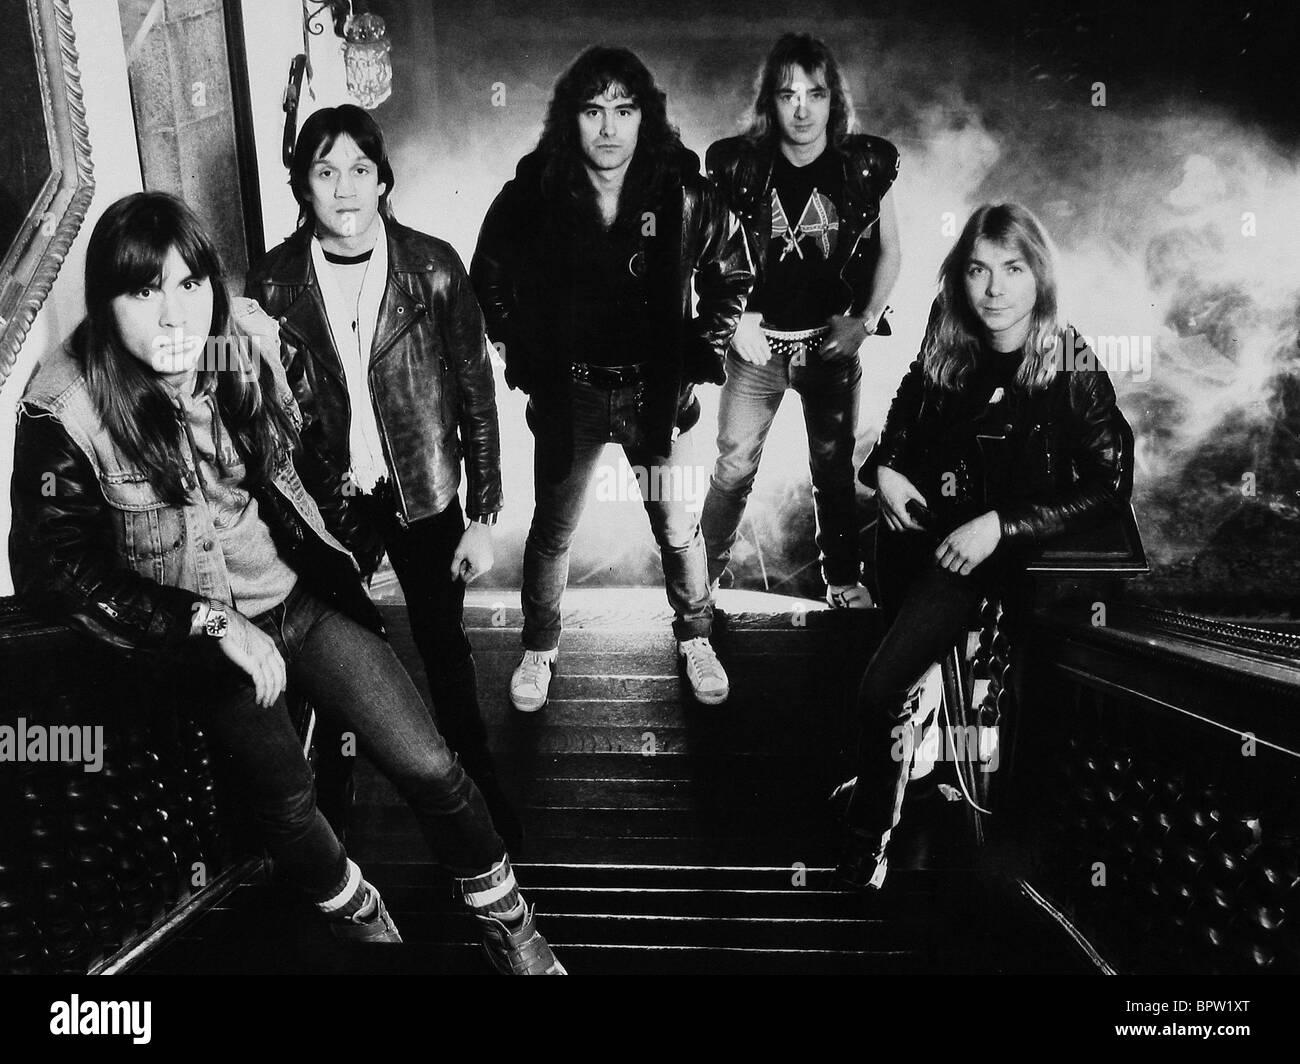 iron maiden iron maiden heavy metal band 1982 stock photo 31283136 alamy. Black Bedroom Furniture Sets. Home Design Ideas